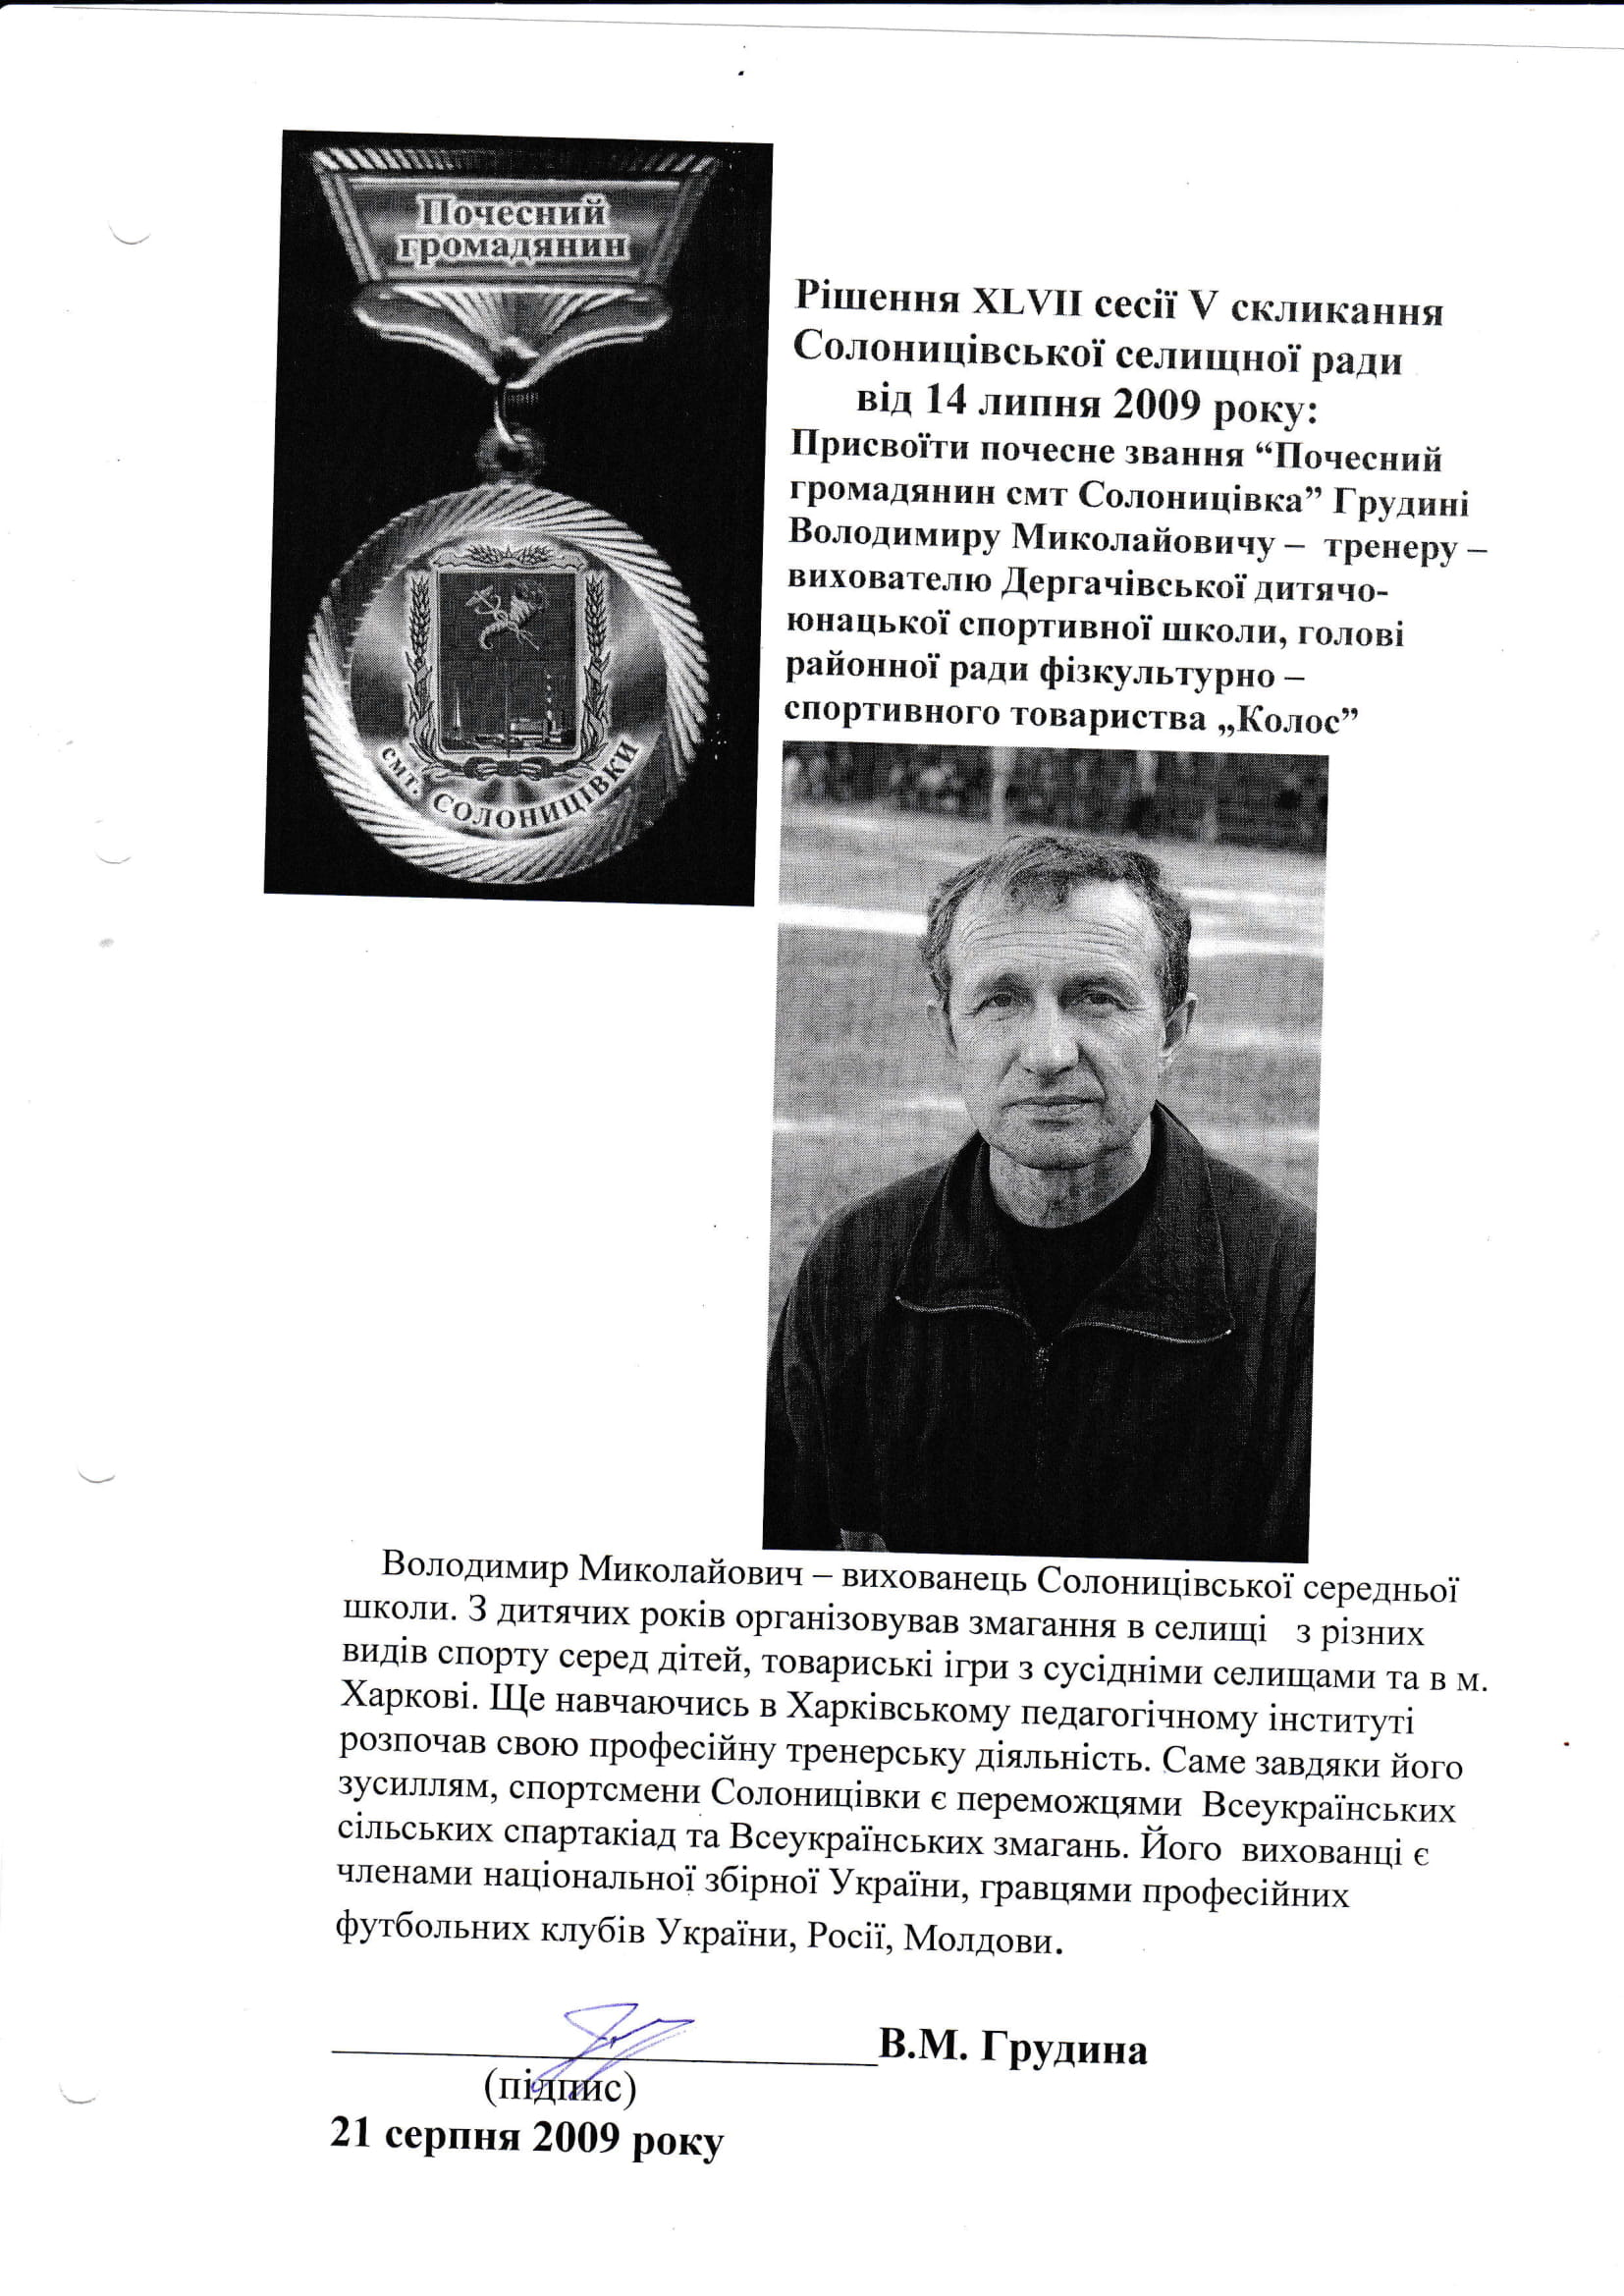 Грудина Володимир Миколайович